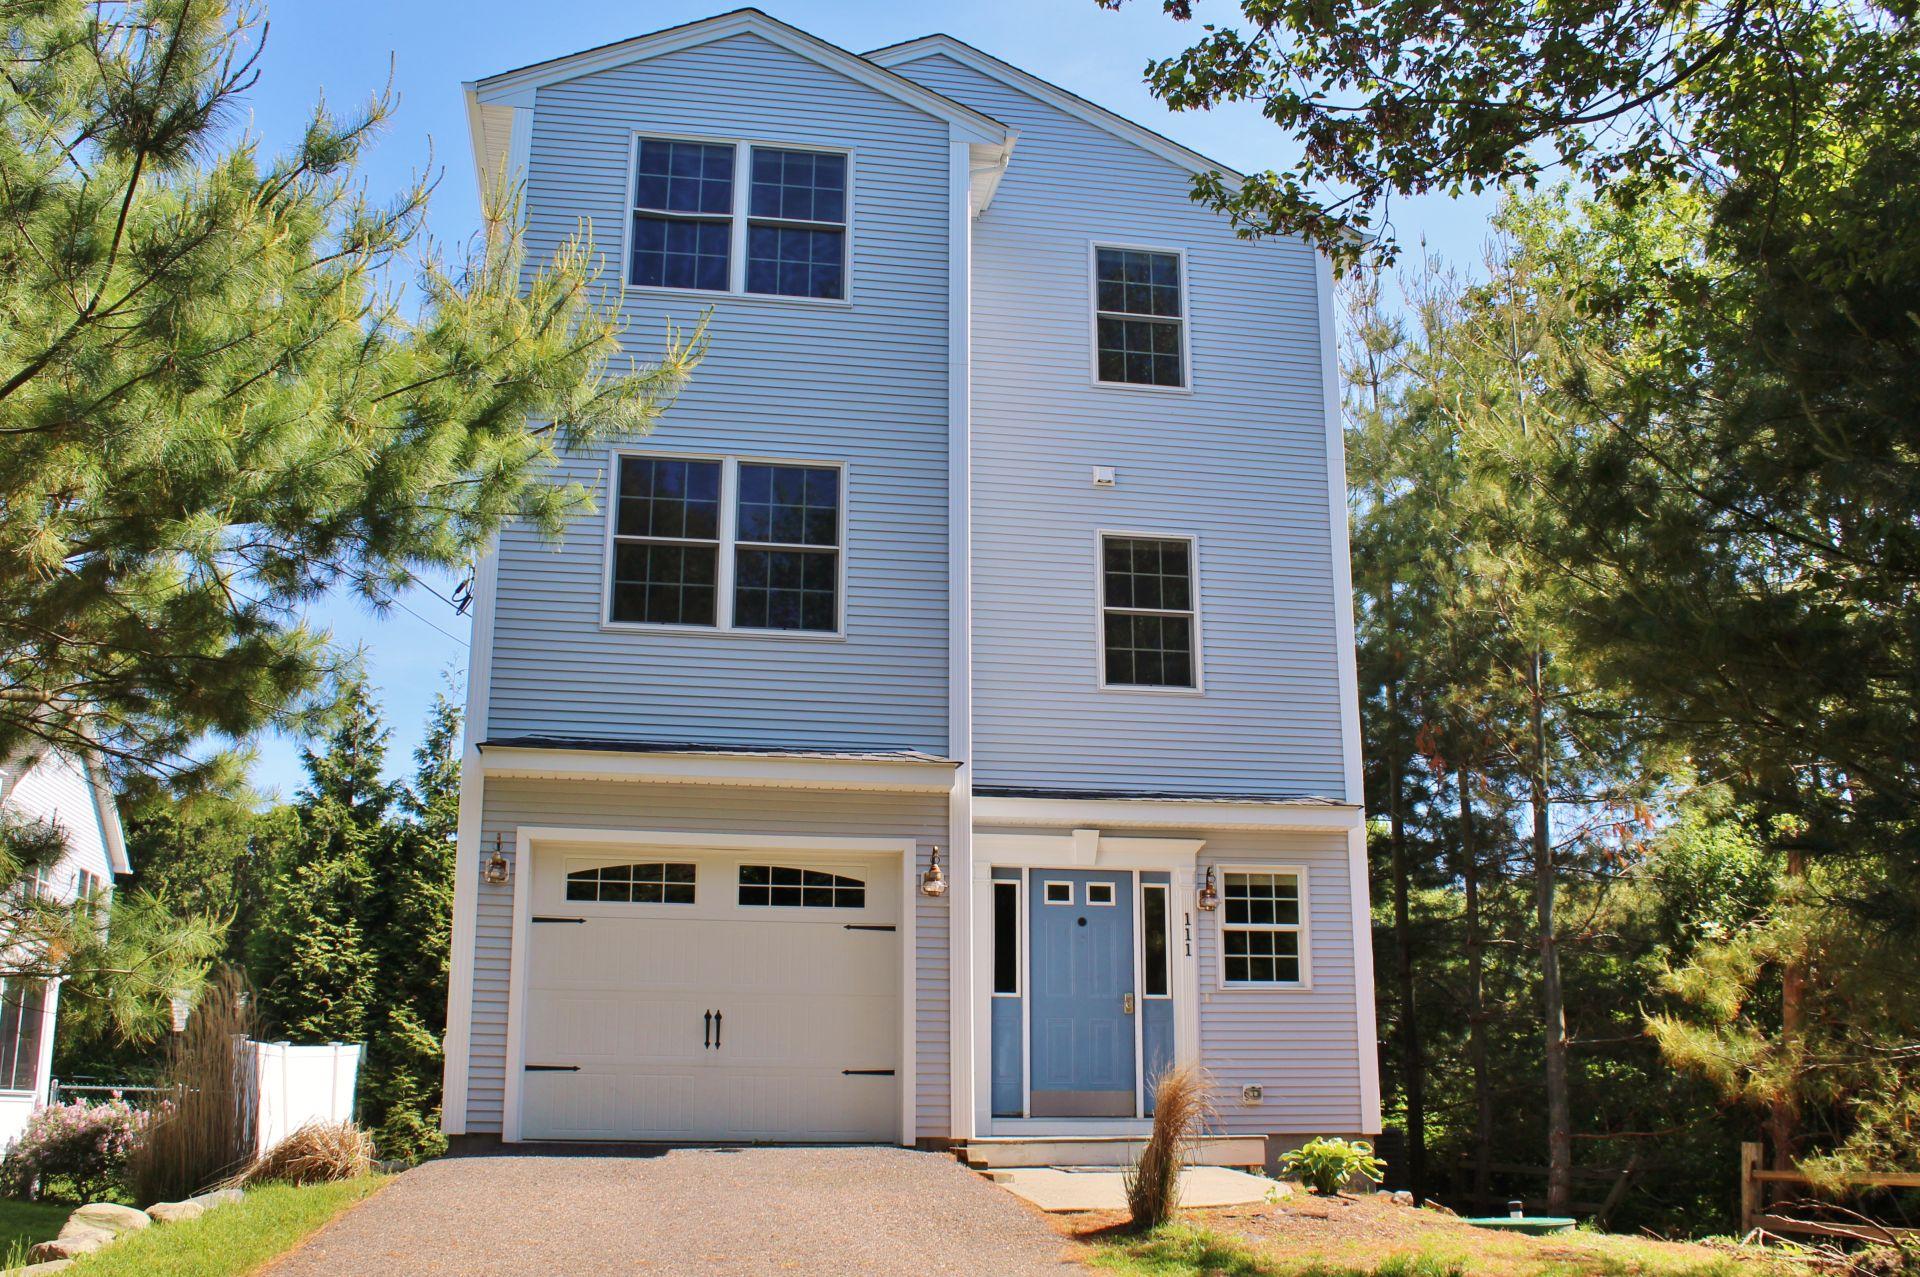 111 Lake Road / Bonnet Shores / Narragansett